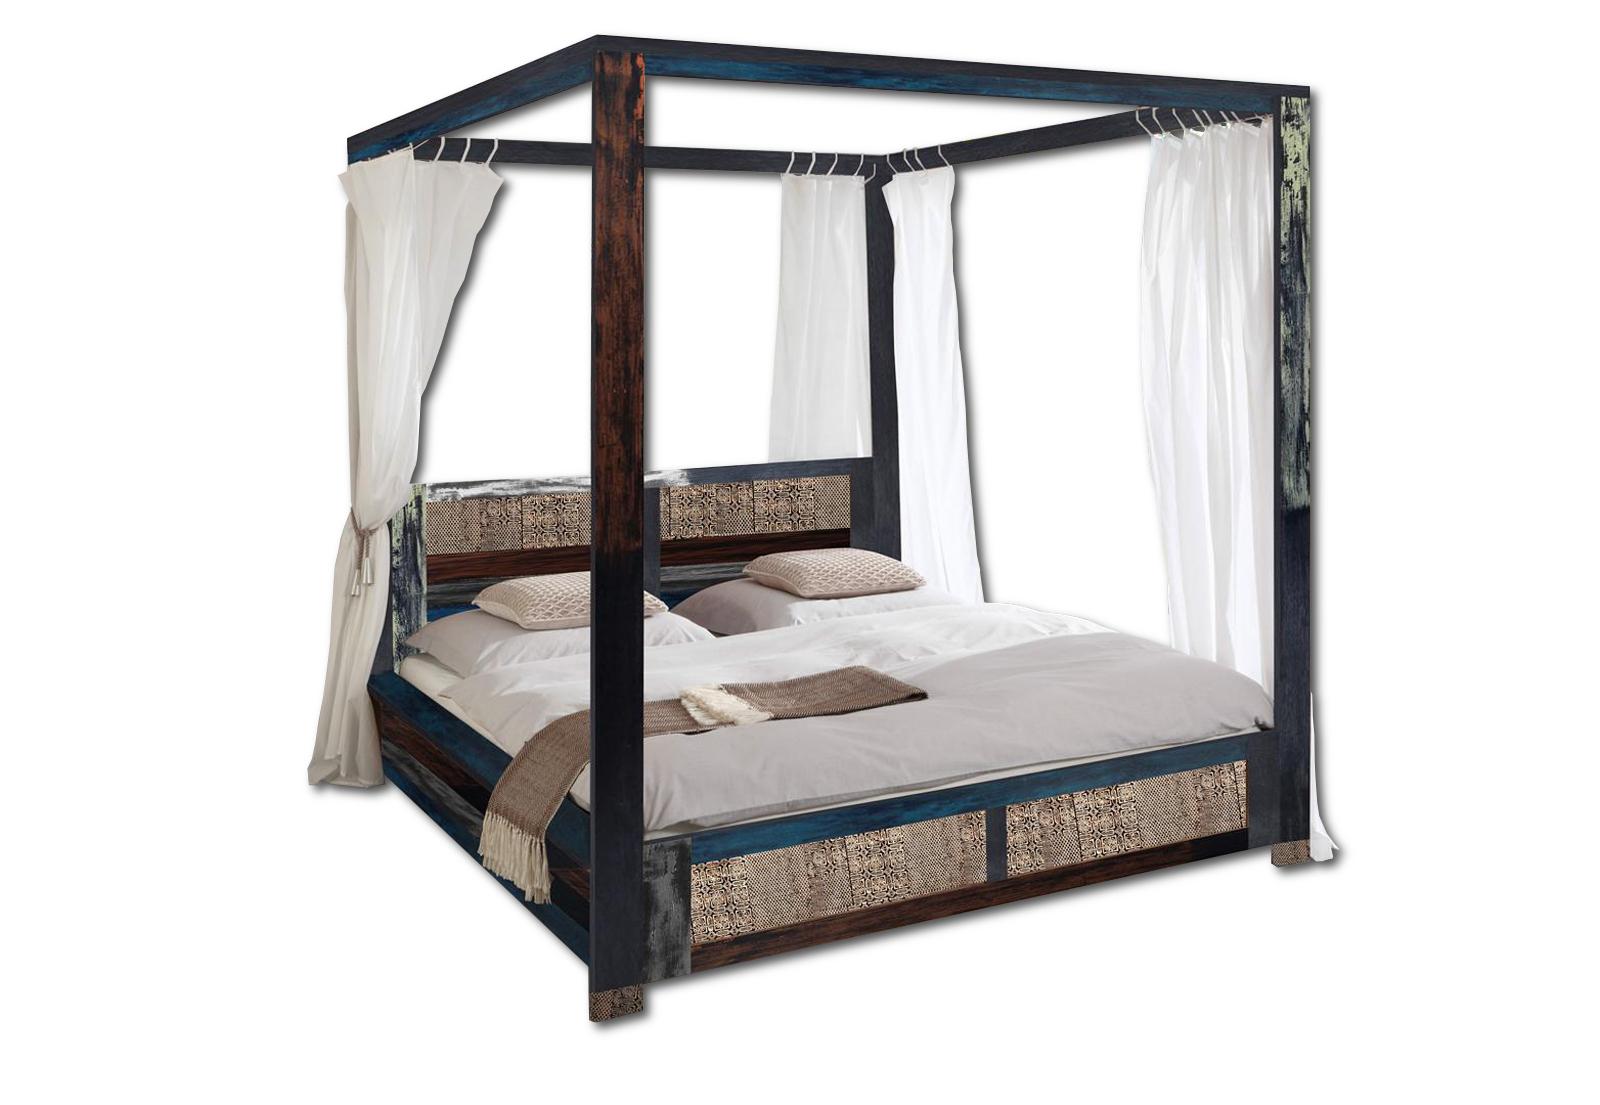 sam vintage himmelbett holzbett metall 200 x 200 cm bunt. Black Bedroom Furniture Sets. Home Design Ideas